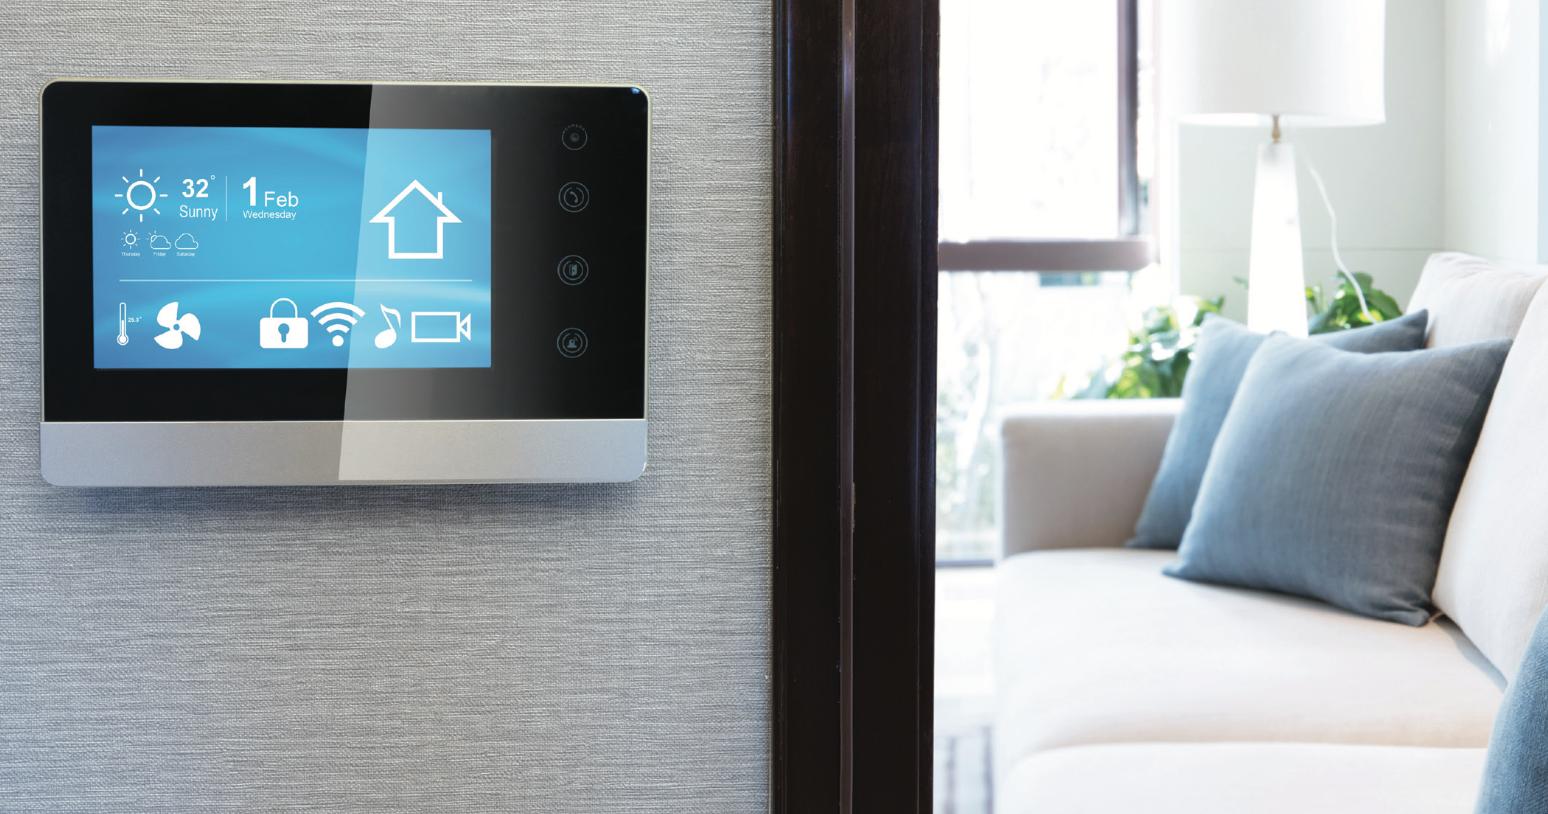 Image result for Get smart: How smart home technology revolutionized rental housing